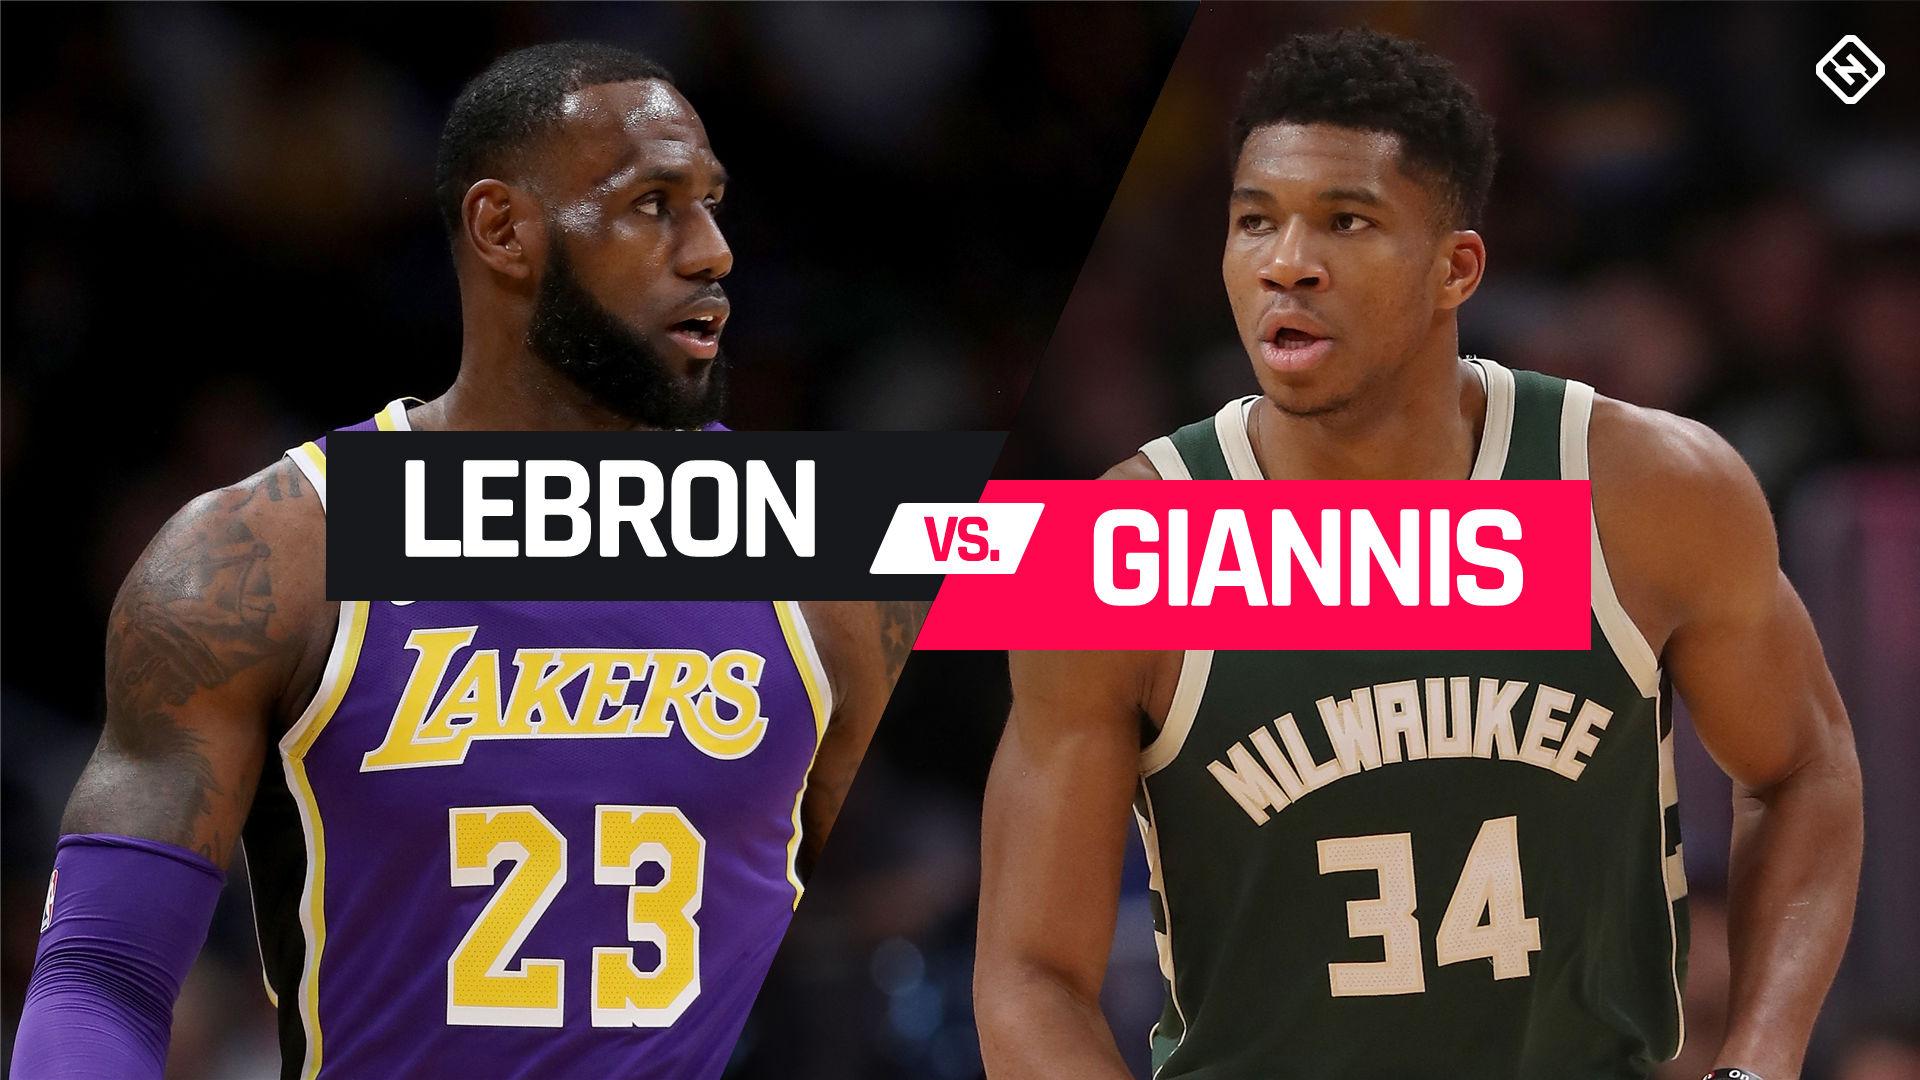 Team LeBron vs. Team Giannis - February 16, 2020 | NBA.com